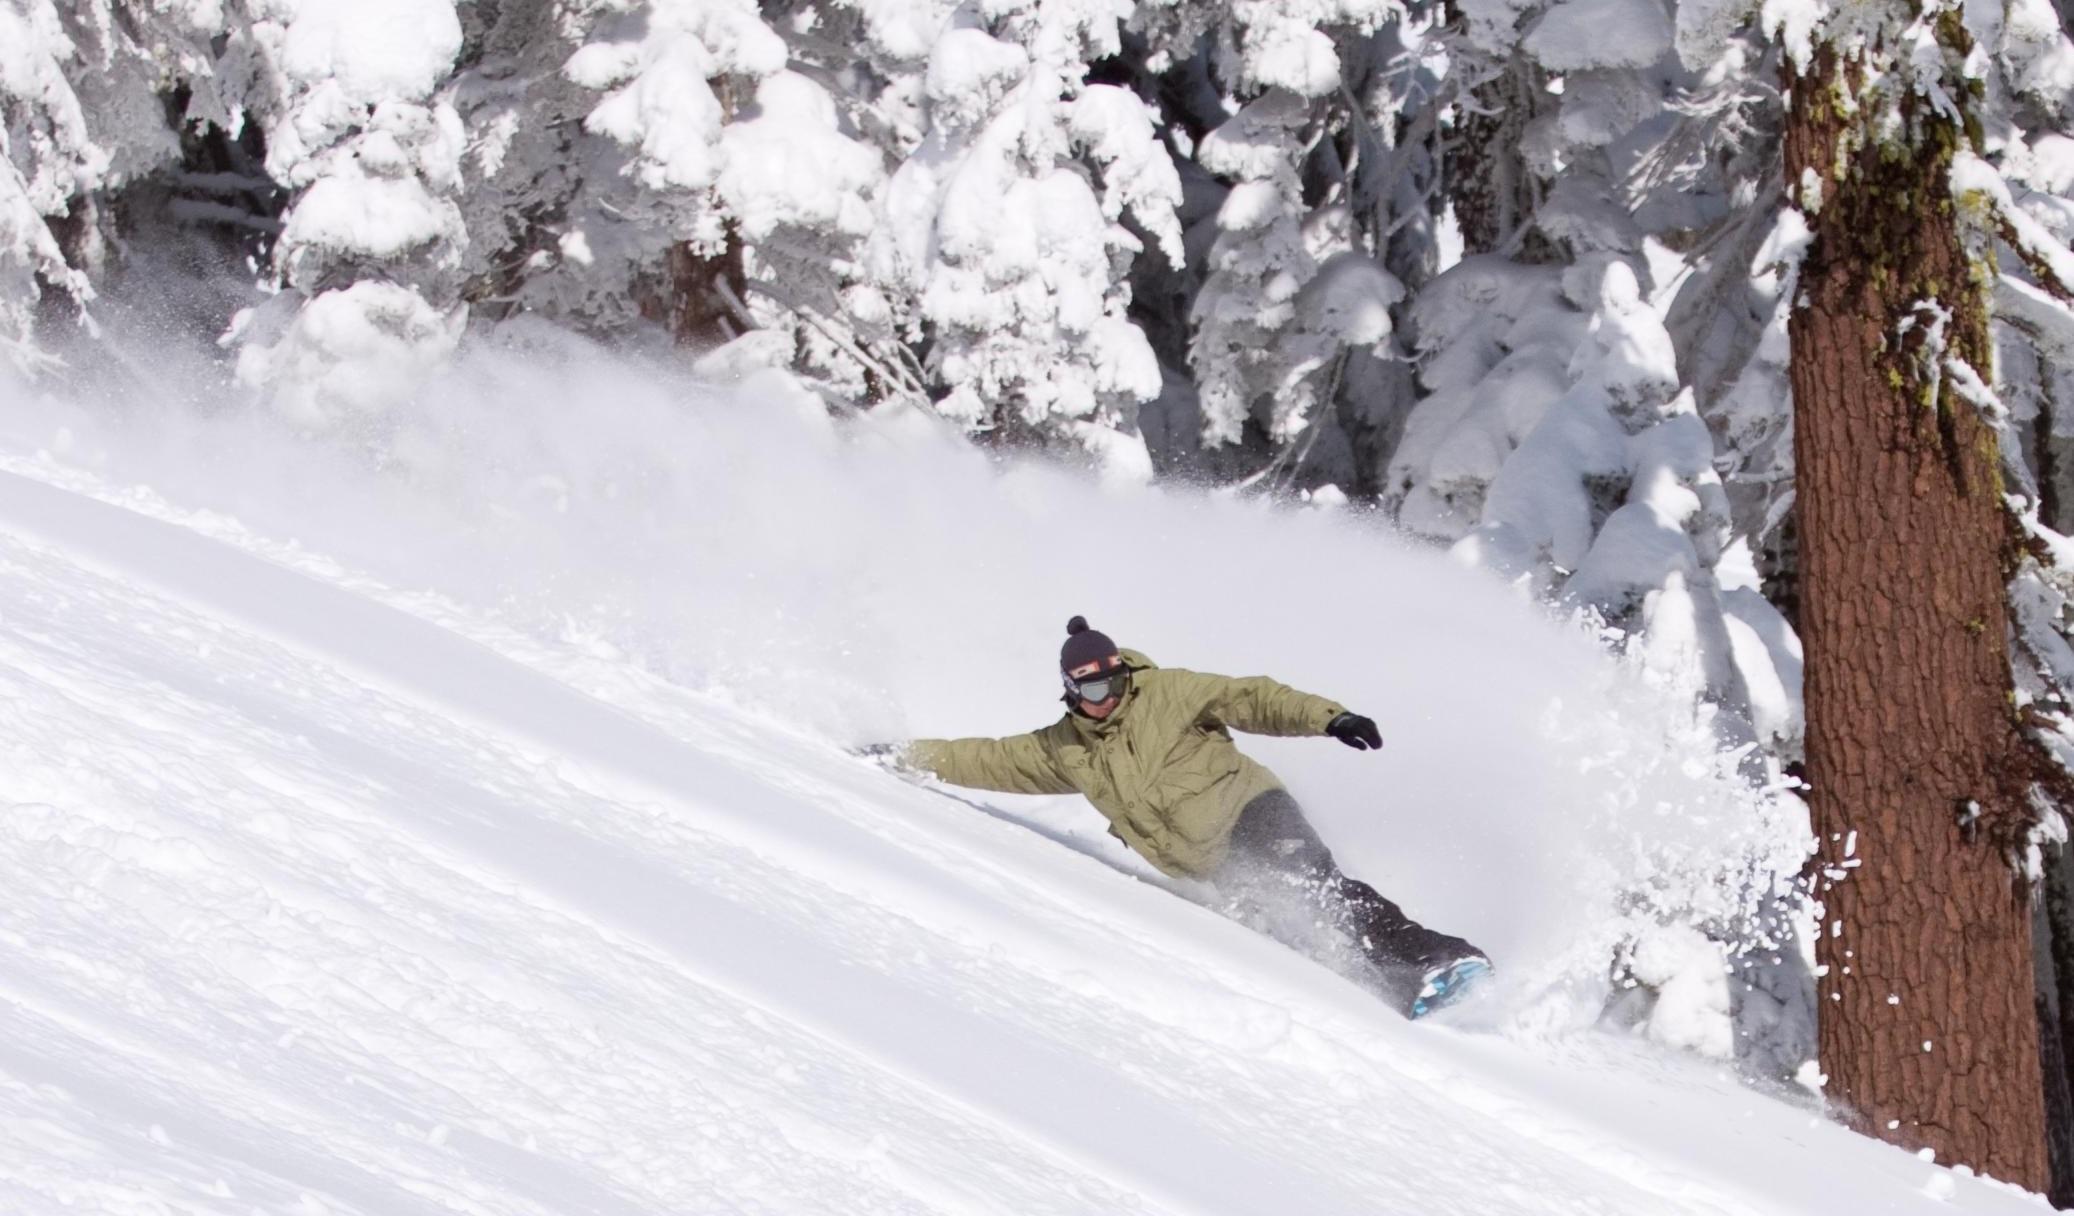 Snowboard Girl Wallpaper Snowboarding Wikiwand